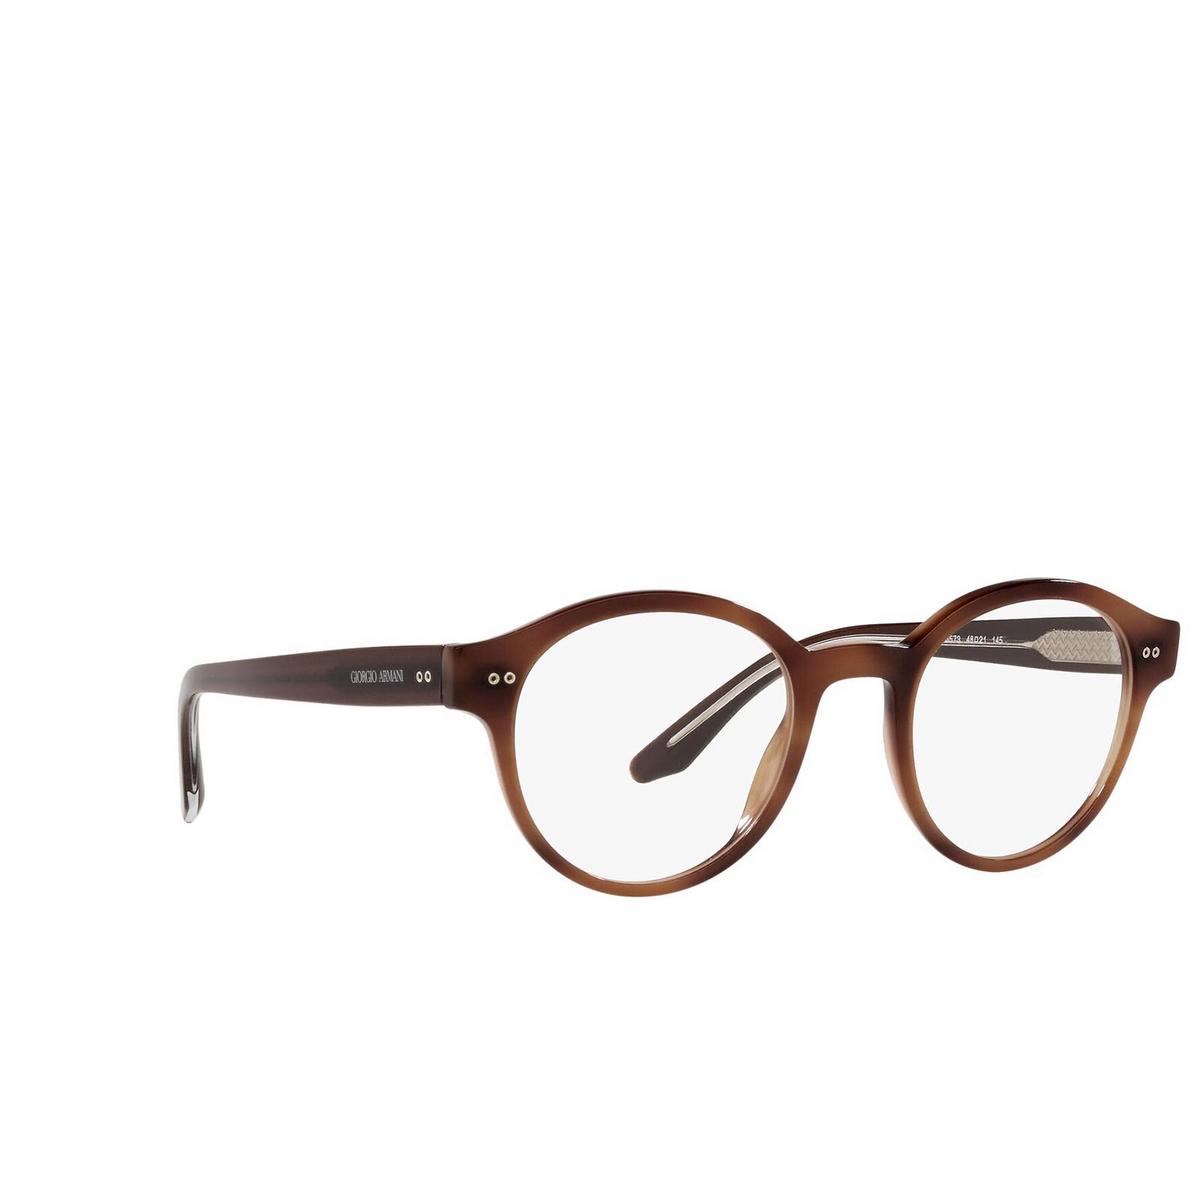 Giorgio Armani® Round Eyeglasses: AR7196 color Striped Brown 5573 - three-quarters view.